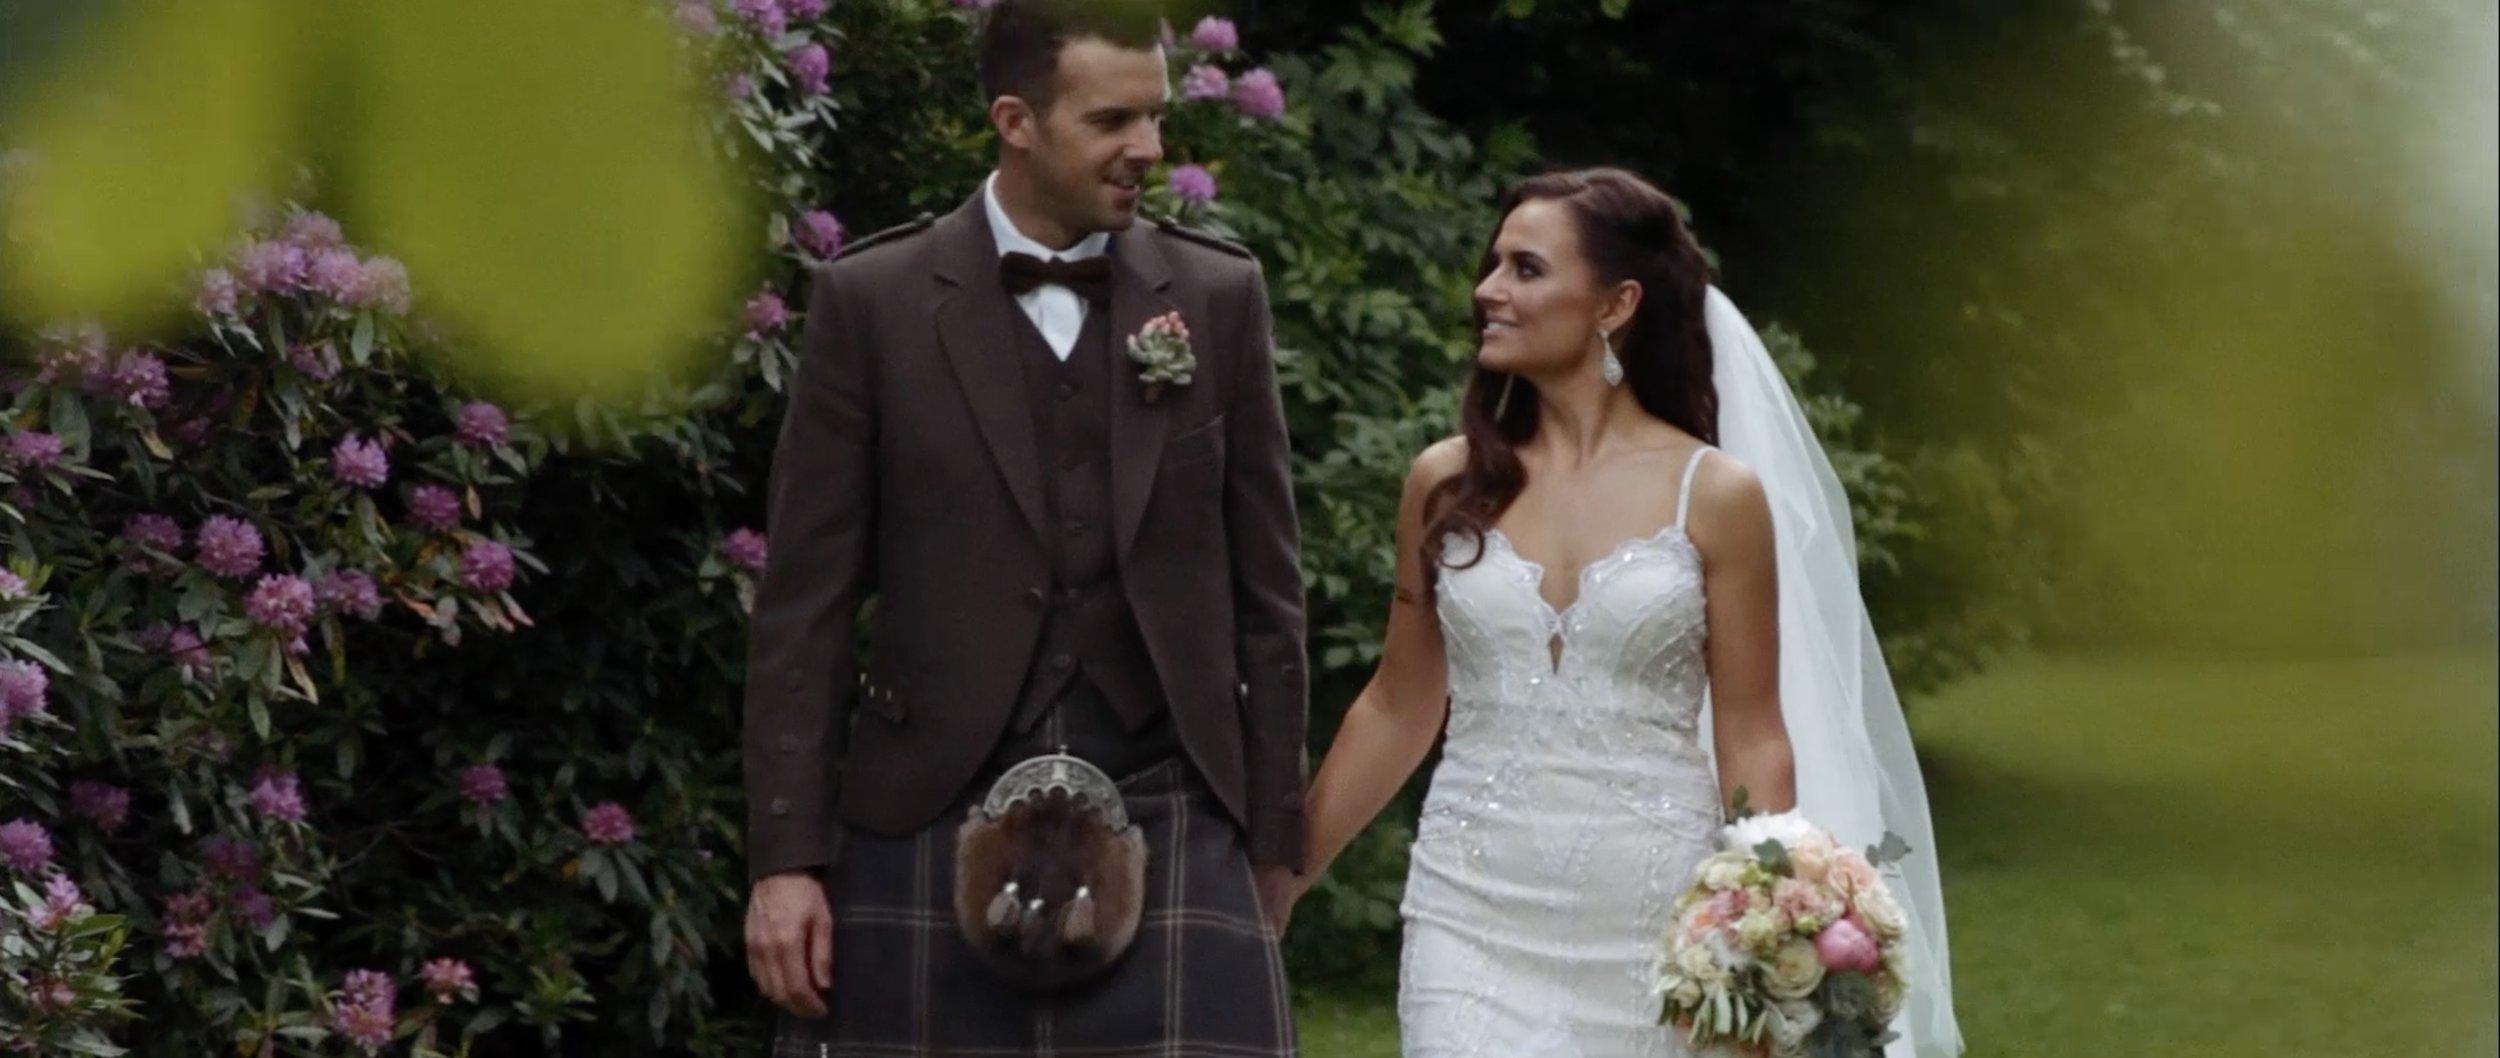 oran-mor-wedding-videographer_LL_06.jpg